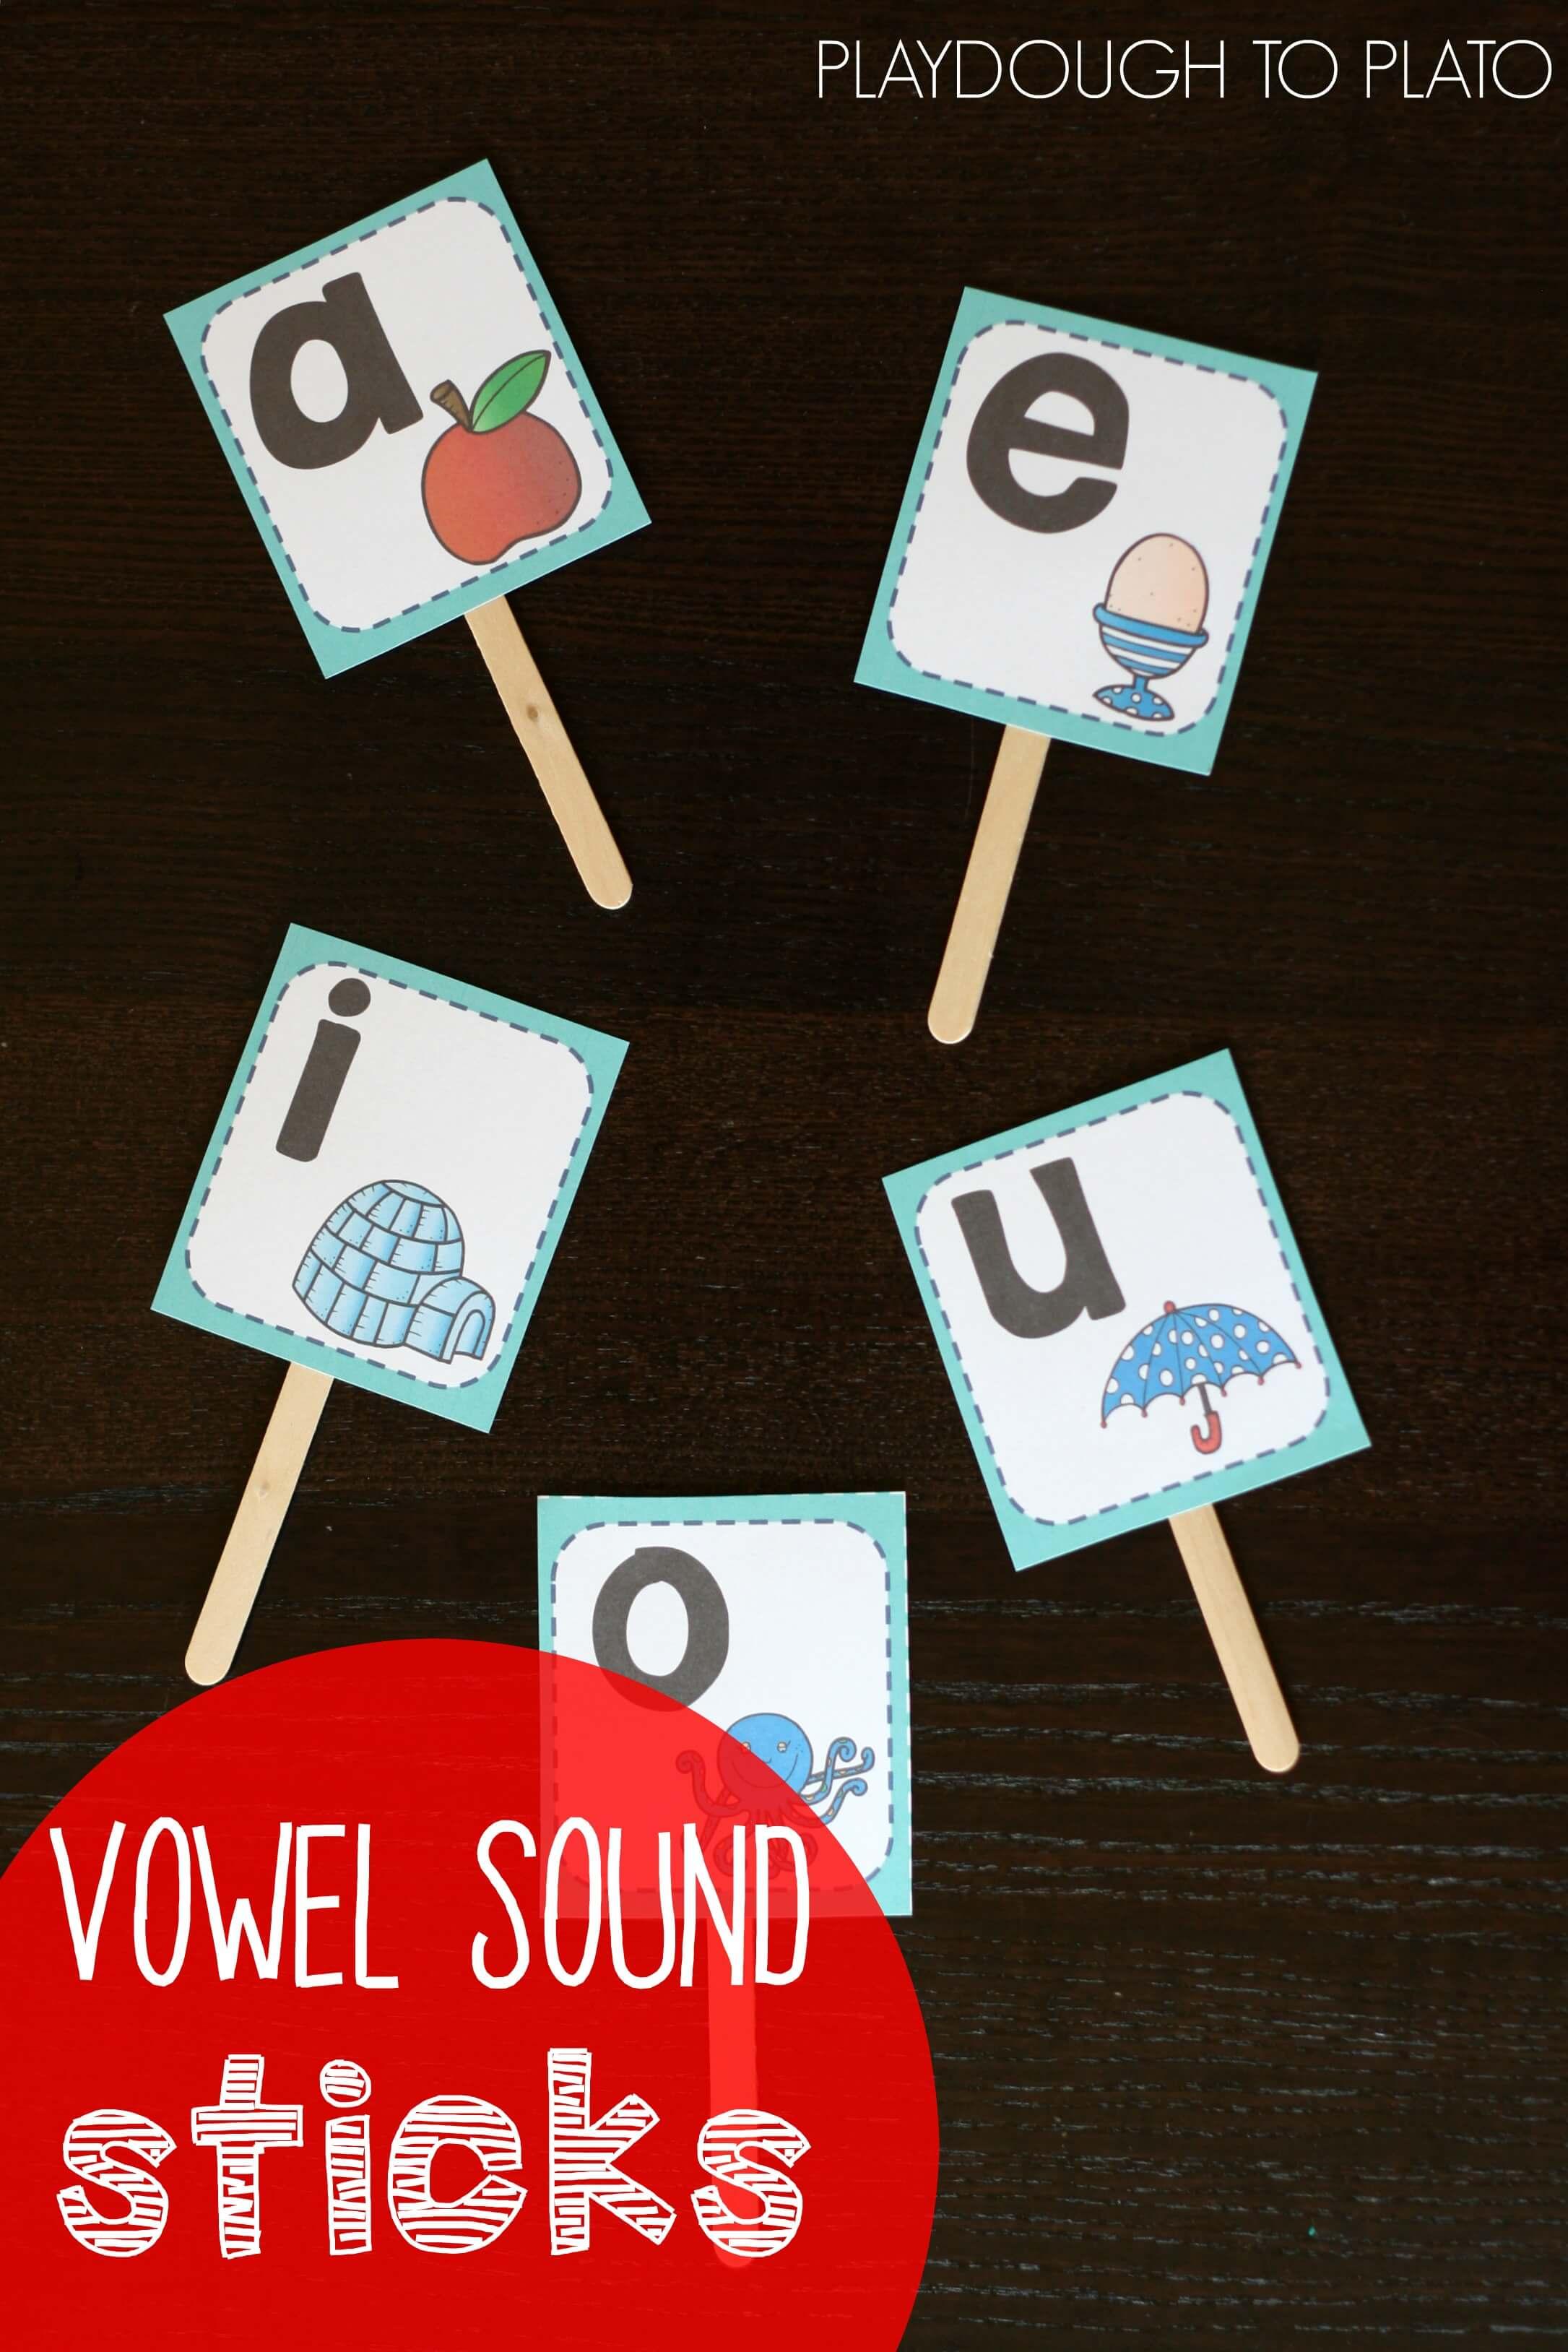 Vowel Sound Sticks